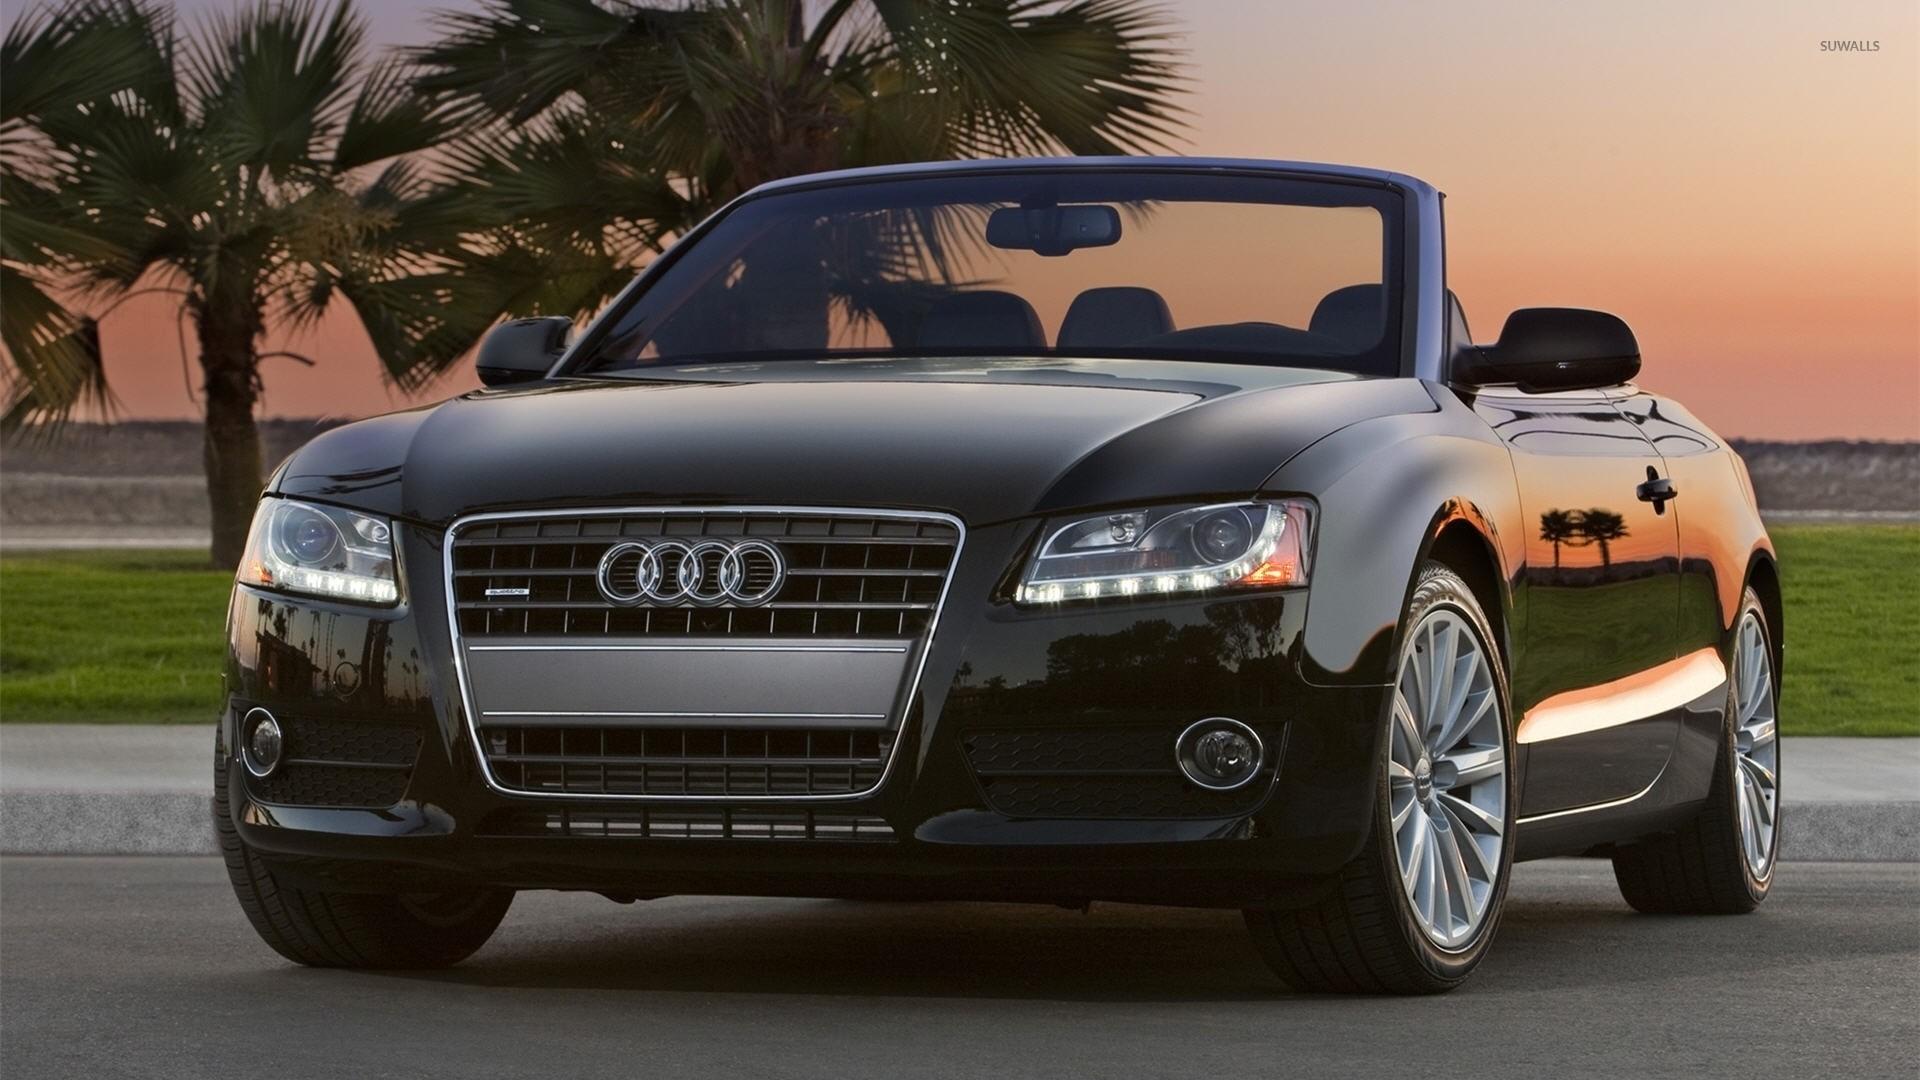 Audi A5 quattro convertible front view wallpaper jpg